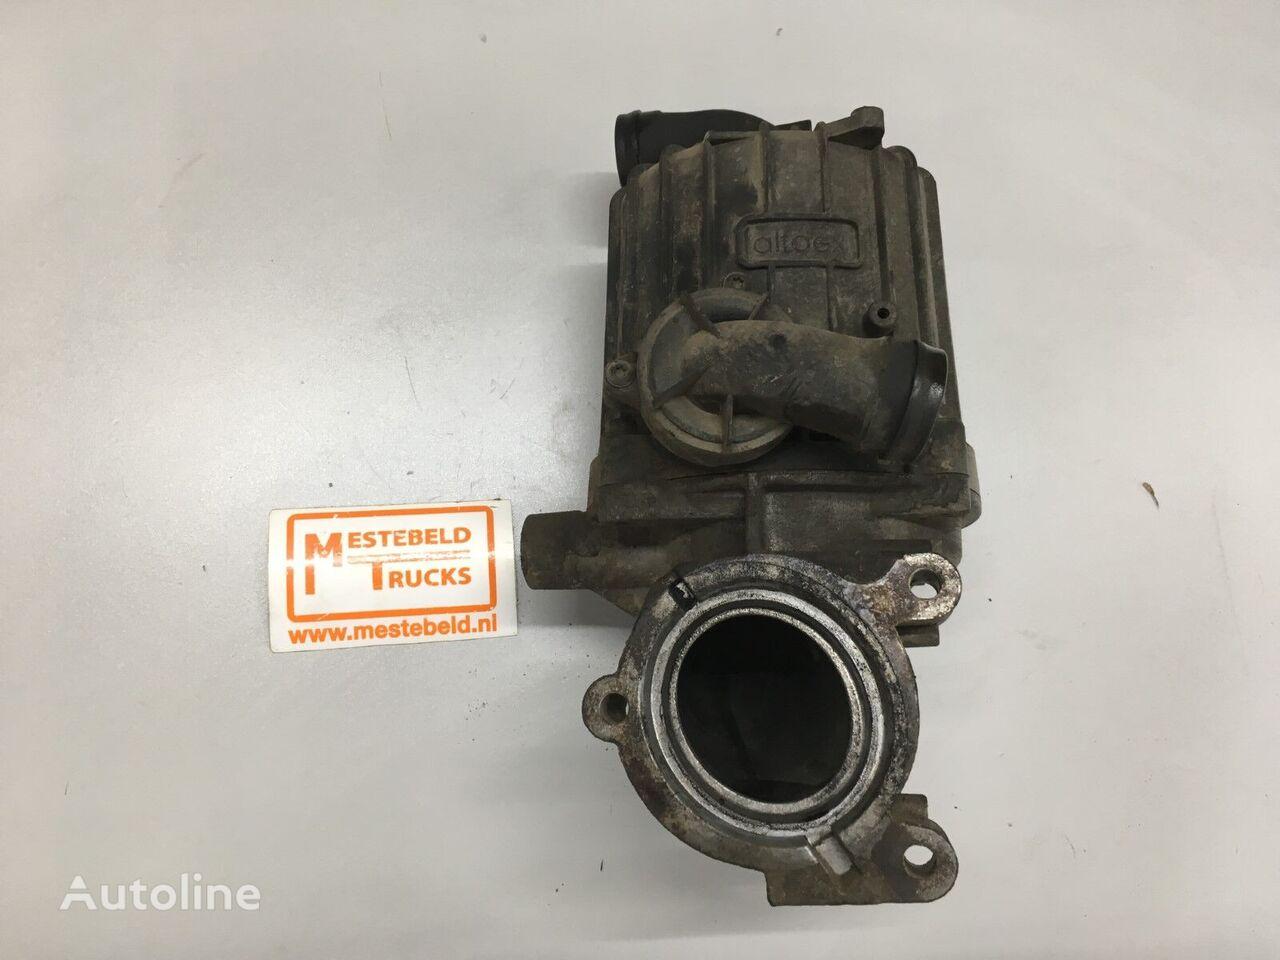 фильтр масляный RENAULT OLIEAFSCHEIDER для грузовика RENAULT DTI 11 460 EUVI EURO6